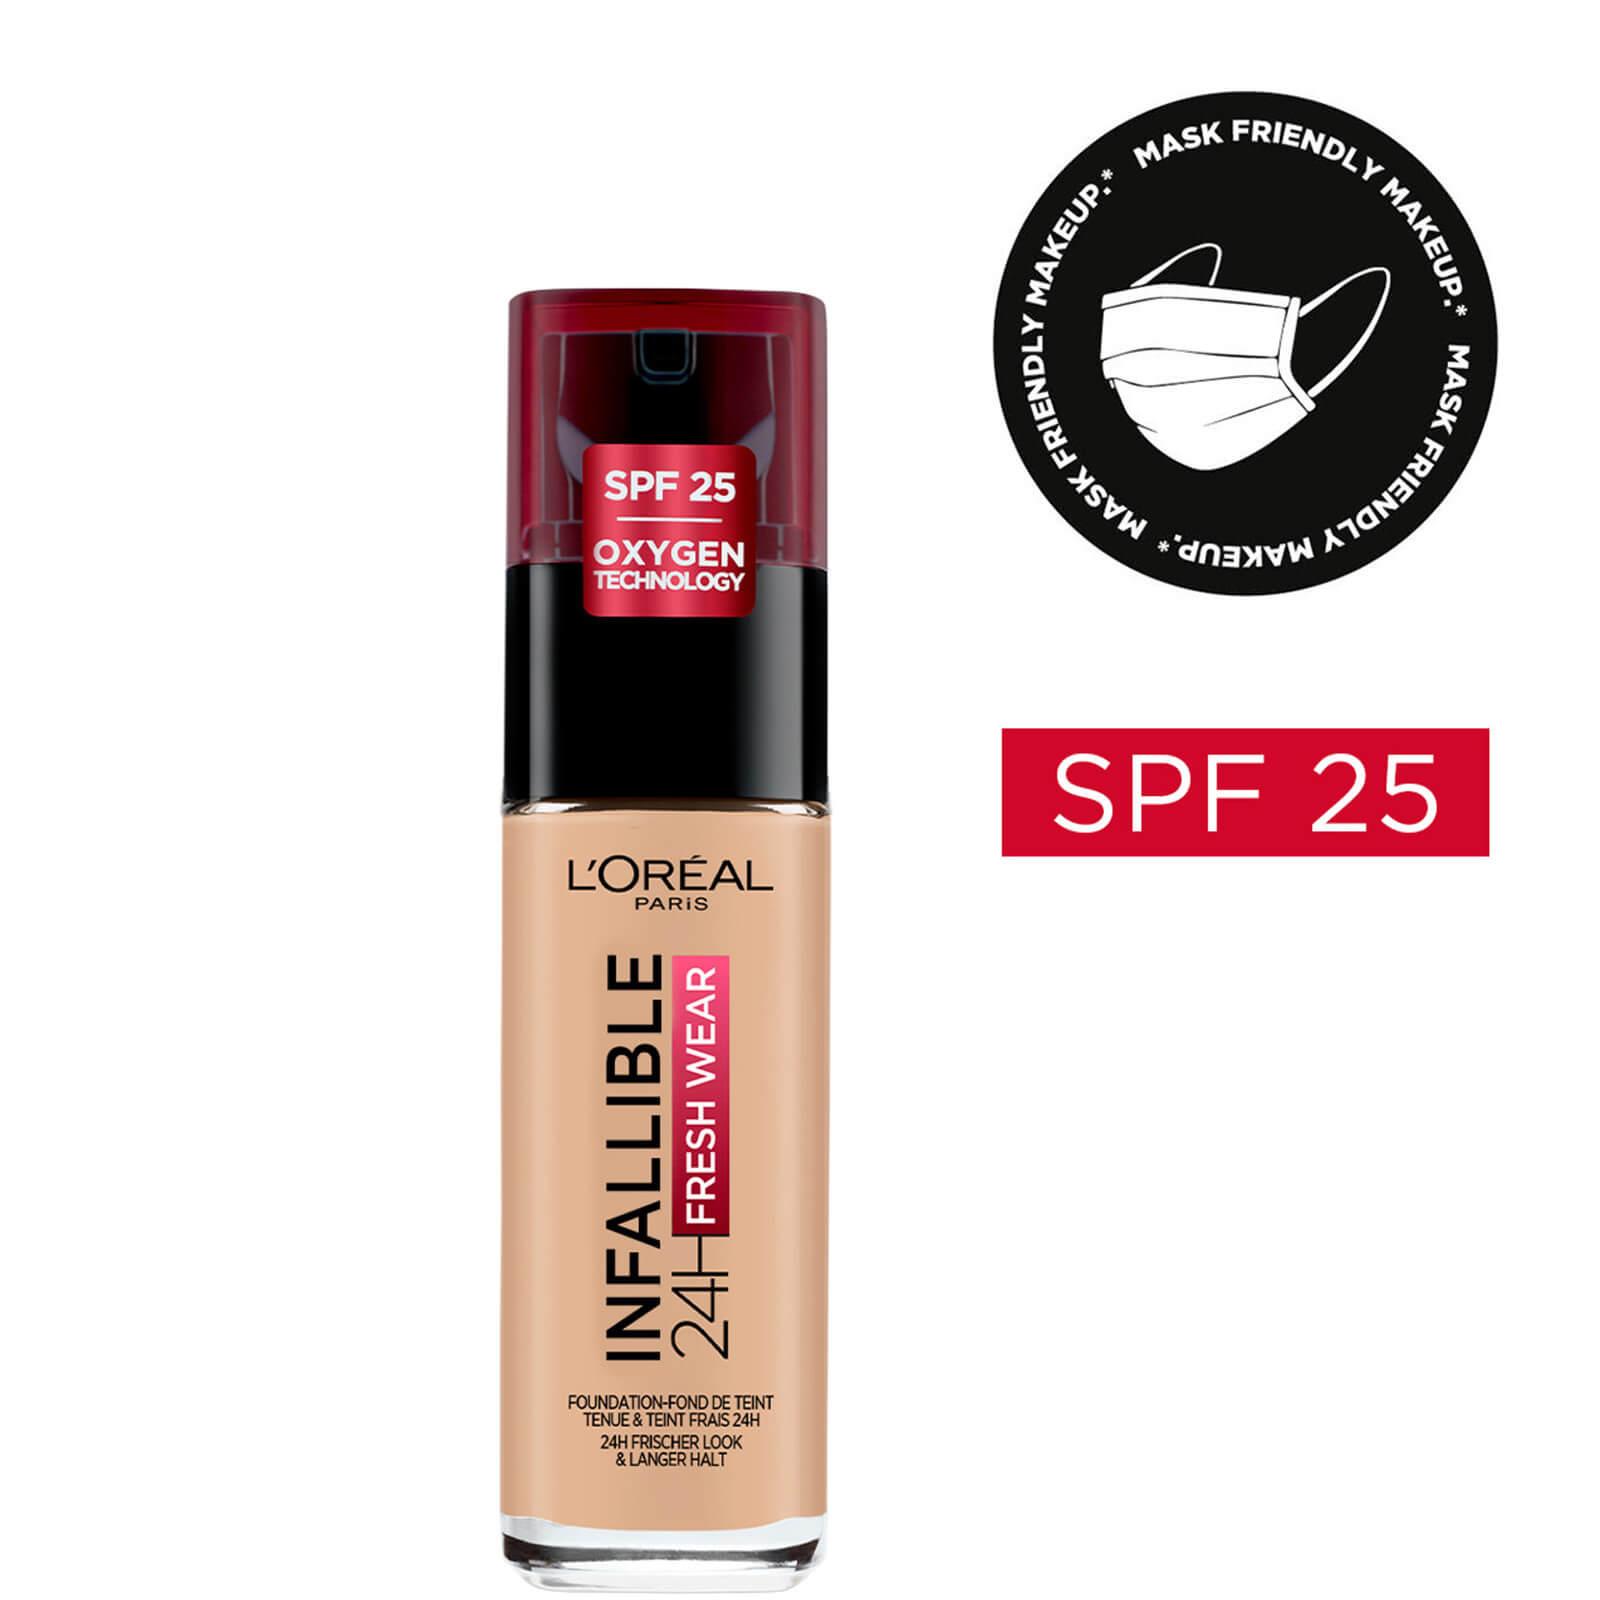 Купить L'Oréal Paris Infallible 24hr Freshwear Liquid Foundation (Various Shades) - 125 Natural Rose